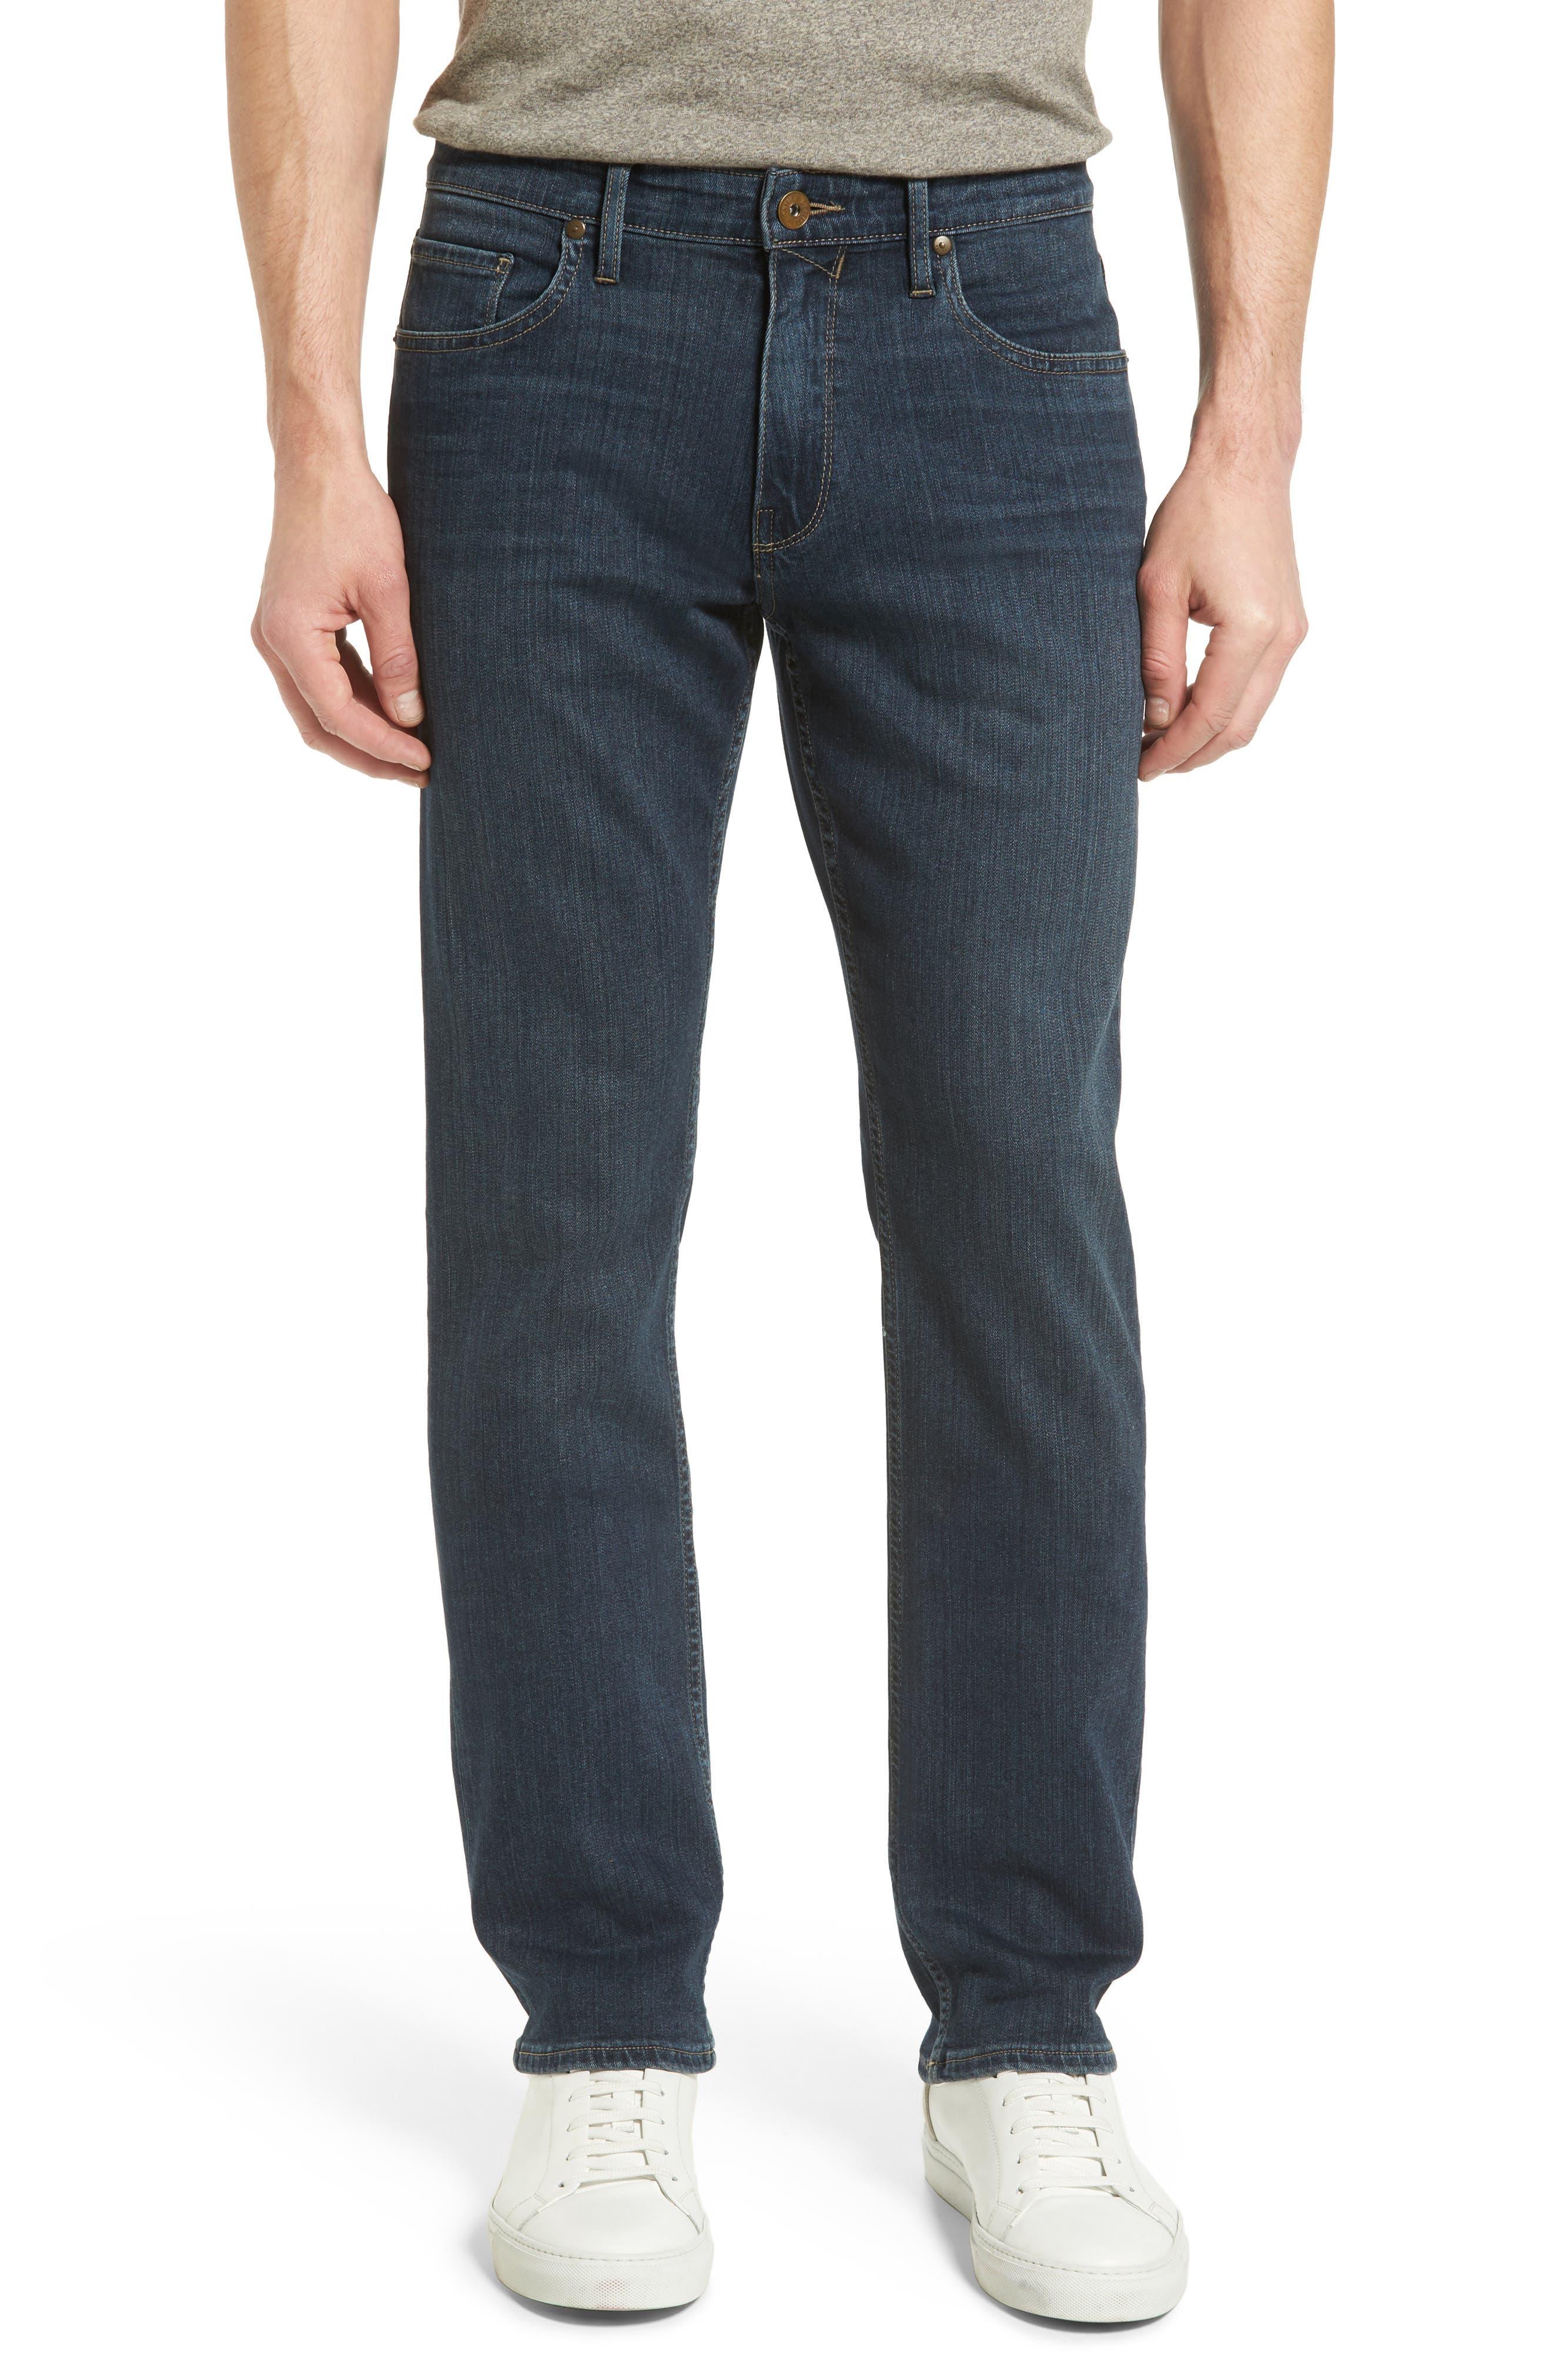 PAIGE Transcend - Normandie Straight Leg Jeans (Husk)